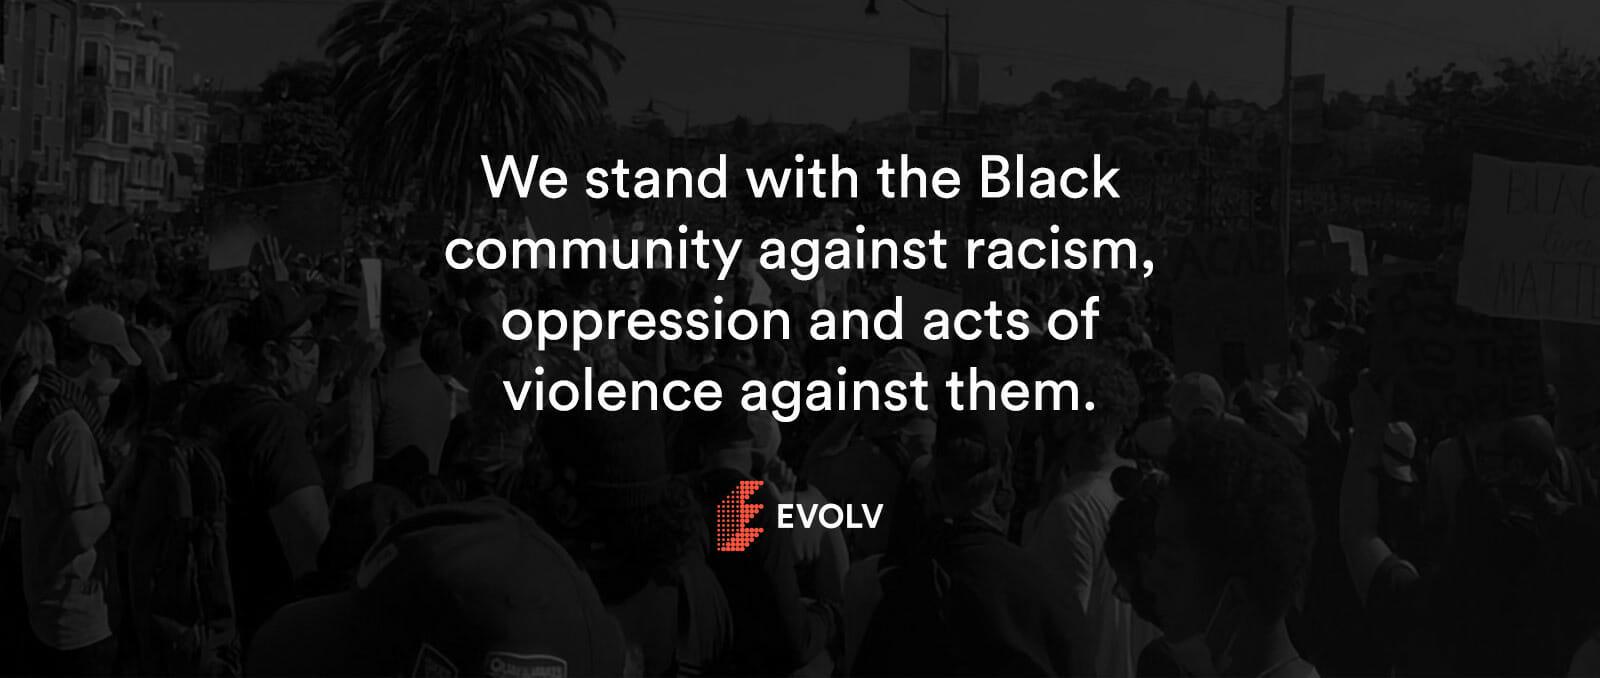 2006-evolv-blog-racism